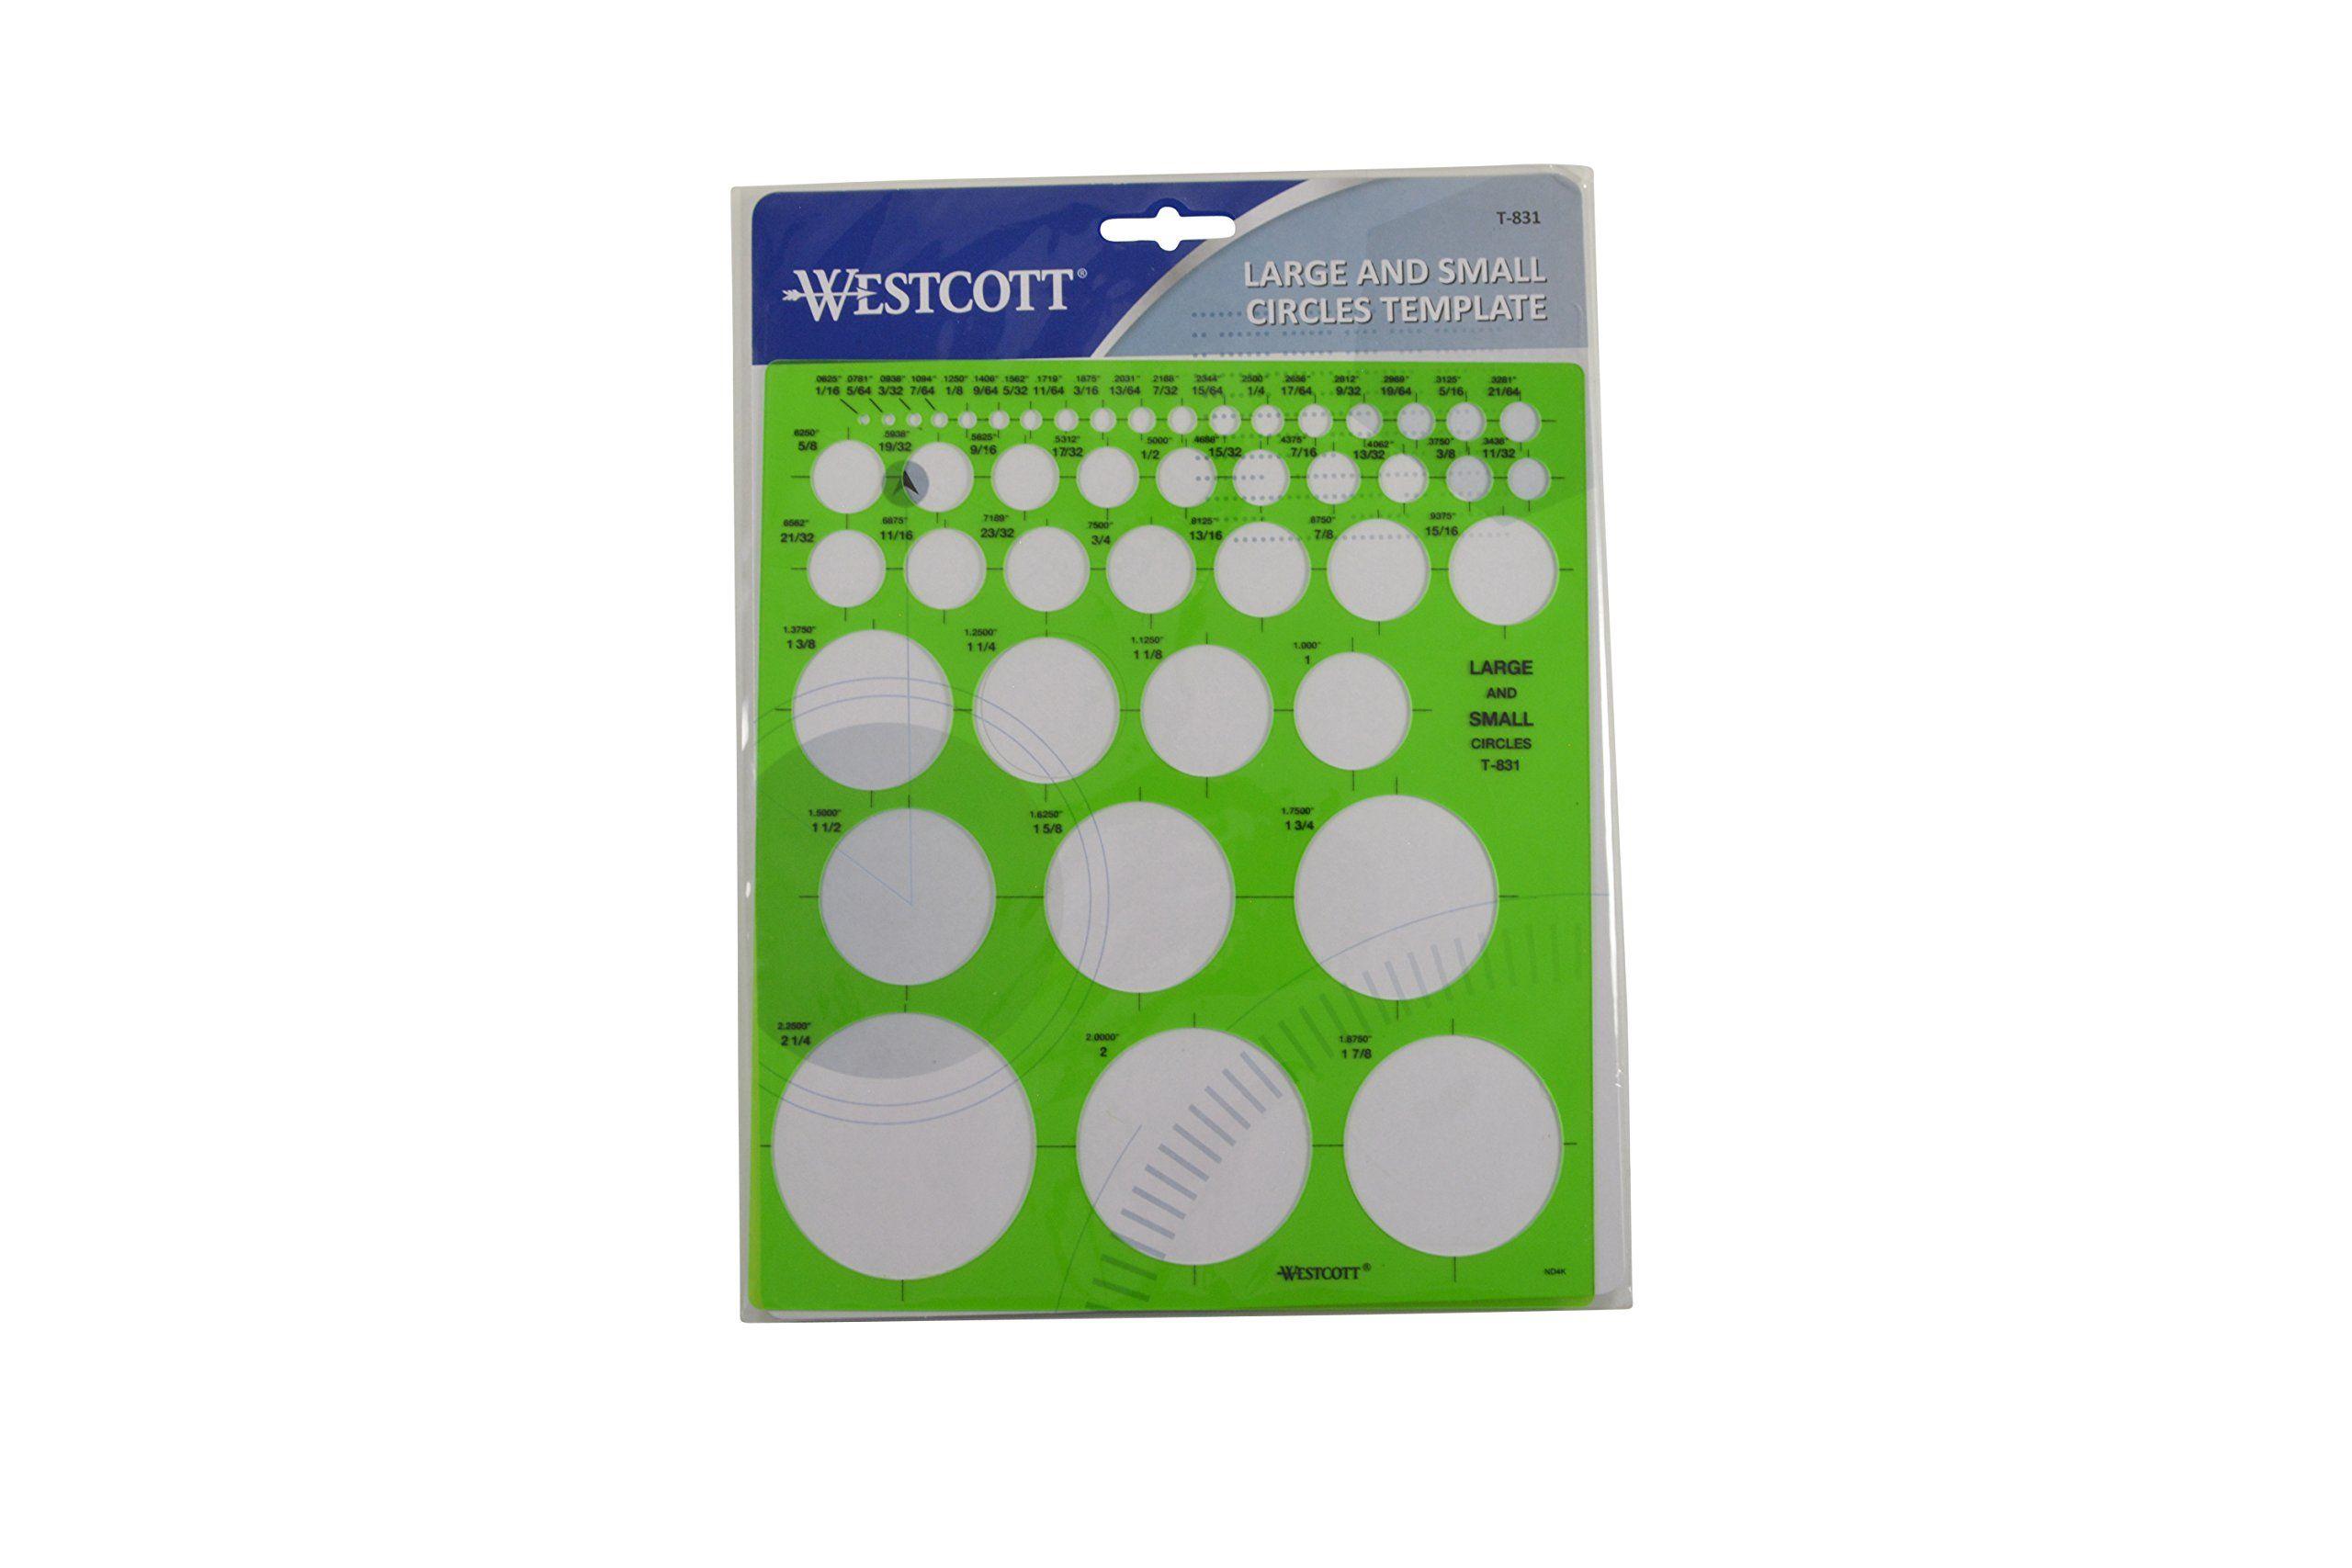 Westcott Small Circles Template